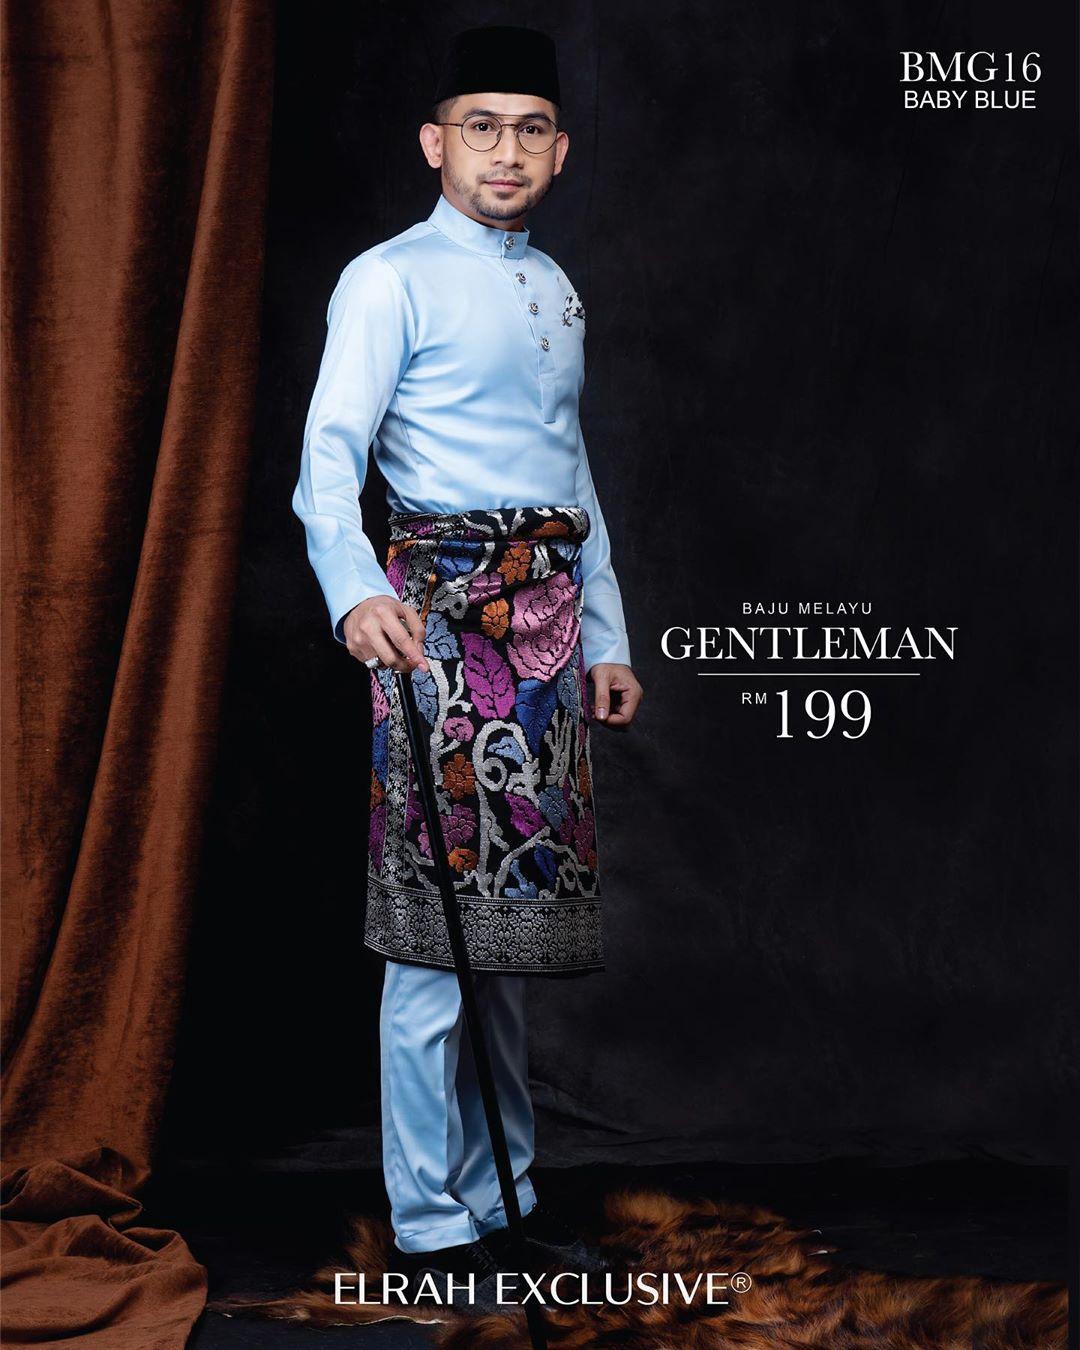 Baju Melayu Gentleman Baby Blue